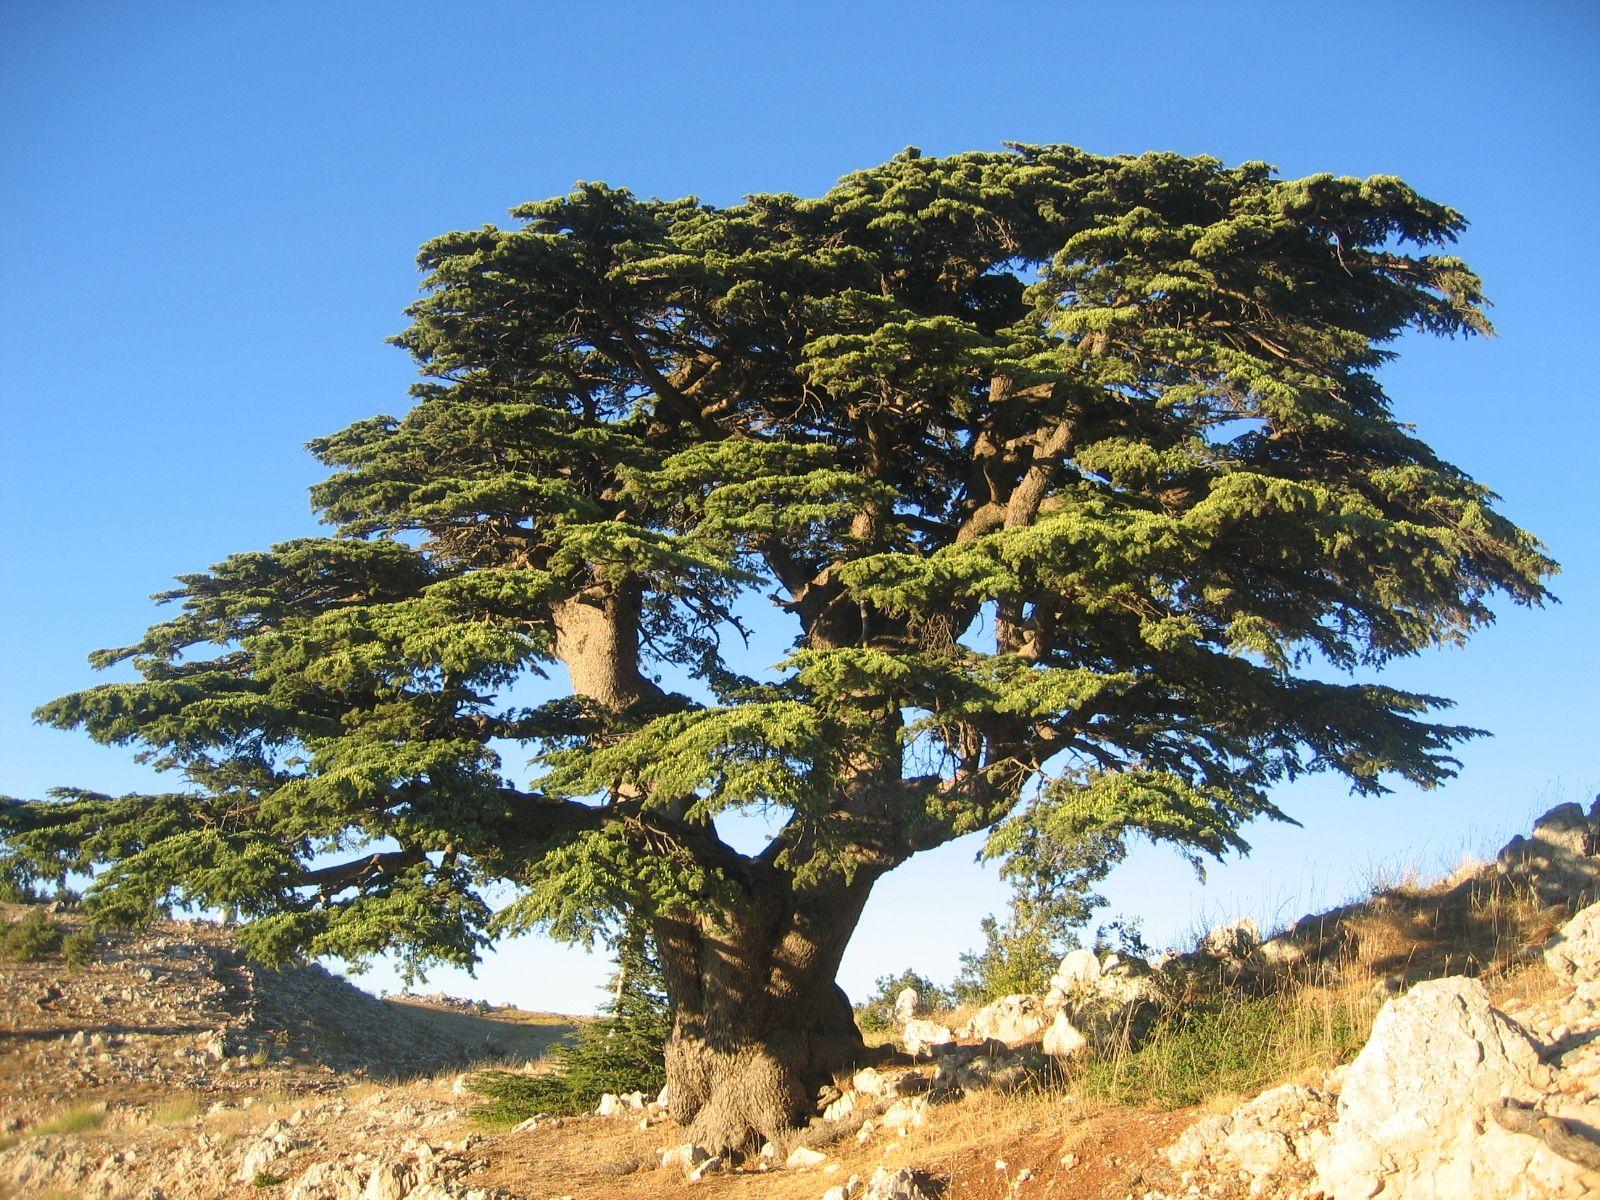 Cedrus Libani, Rvore Consagrada A J Piter, Regente De 2014